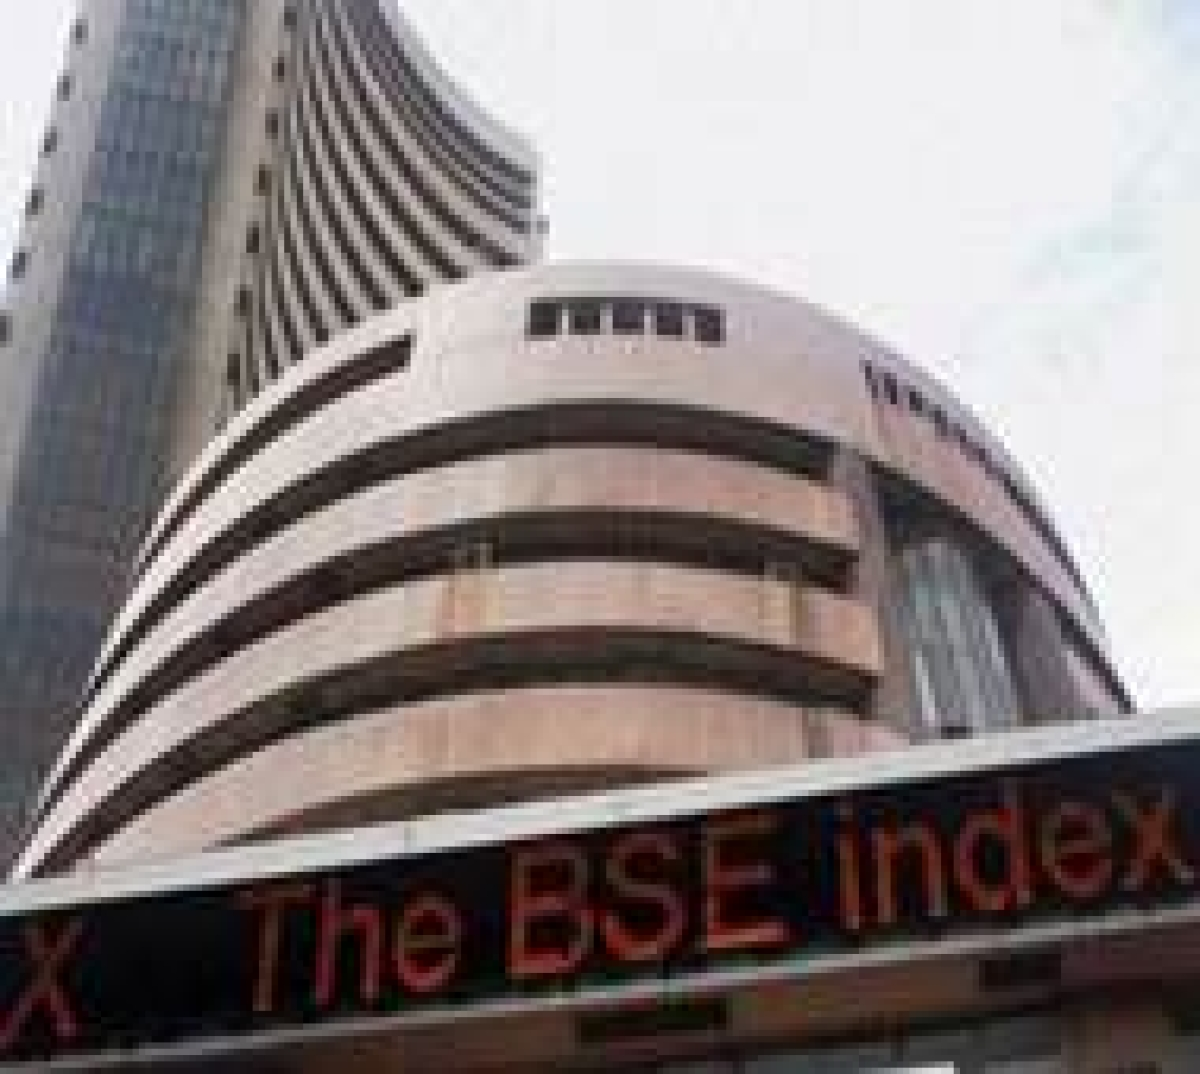 Sensex ends up 134 pts, Nifty misses 8400; Coal India up